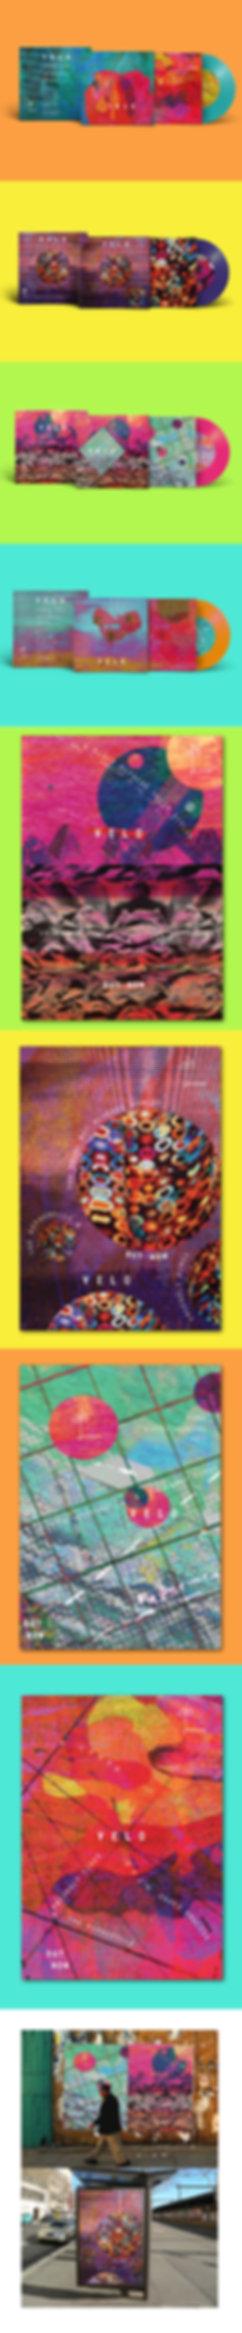 Velo - Telophase - Studio Intro Brief Vinyl album cover design concept by Jasmin Issaka Graphic designer & illustrator